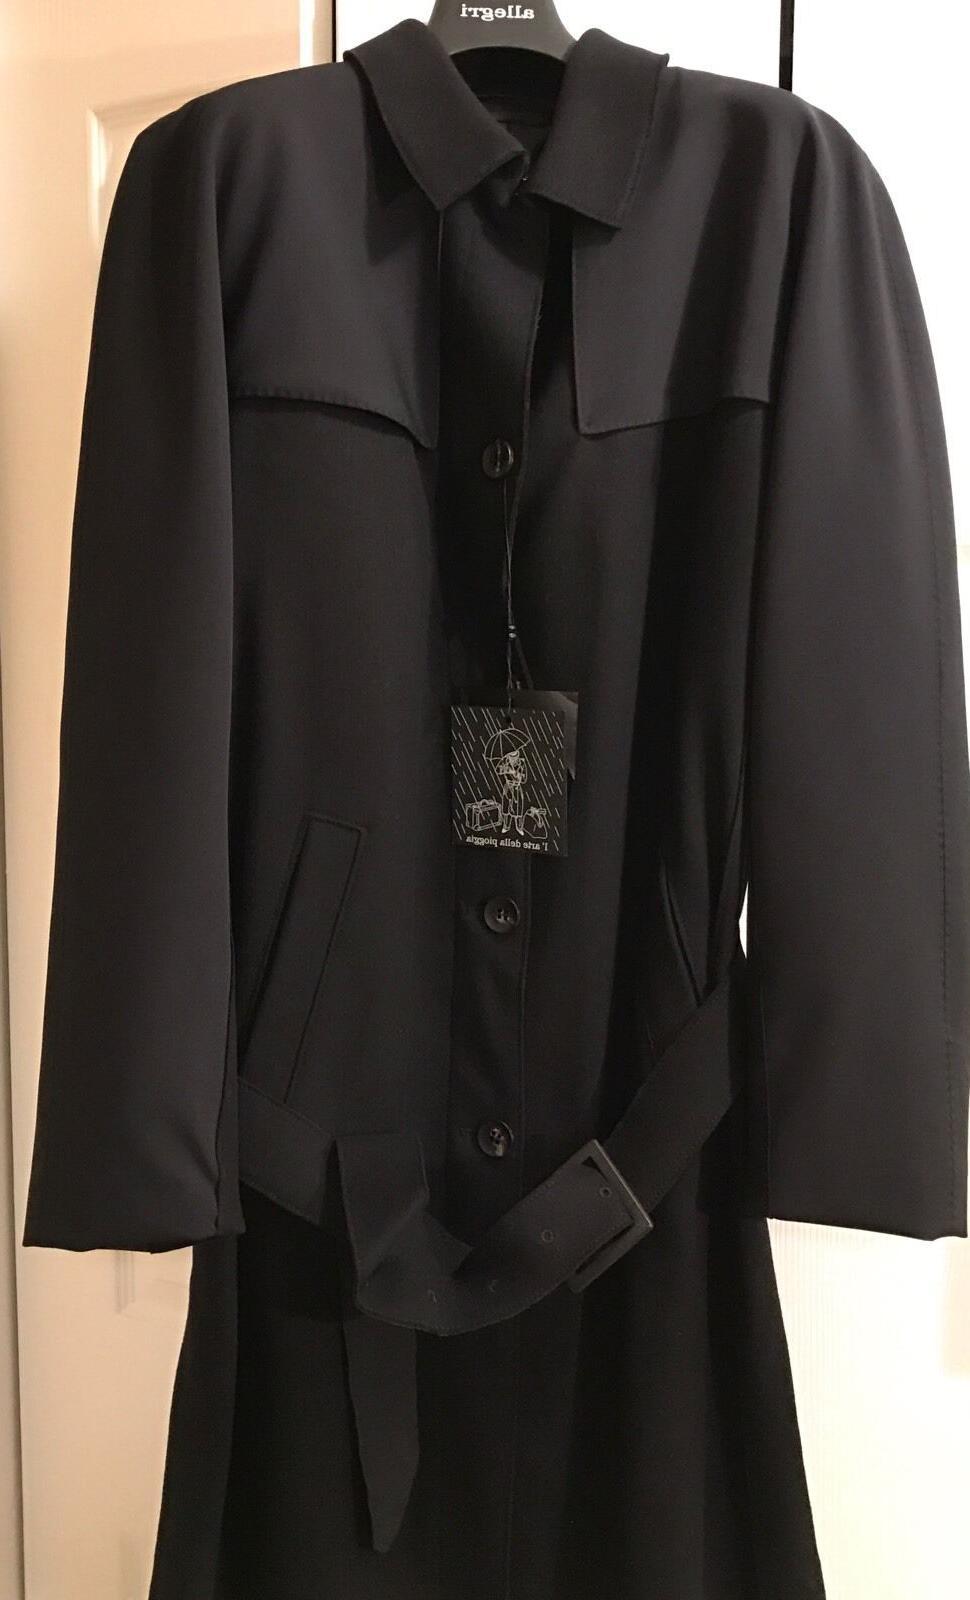 ALLEGRI acket Coat 50 Size Italy